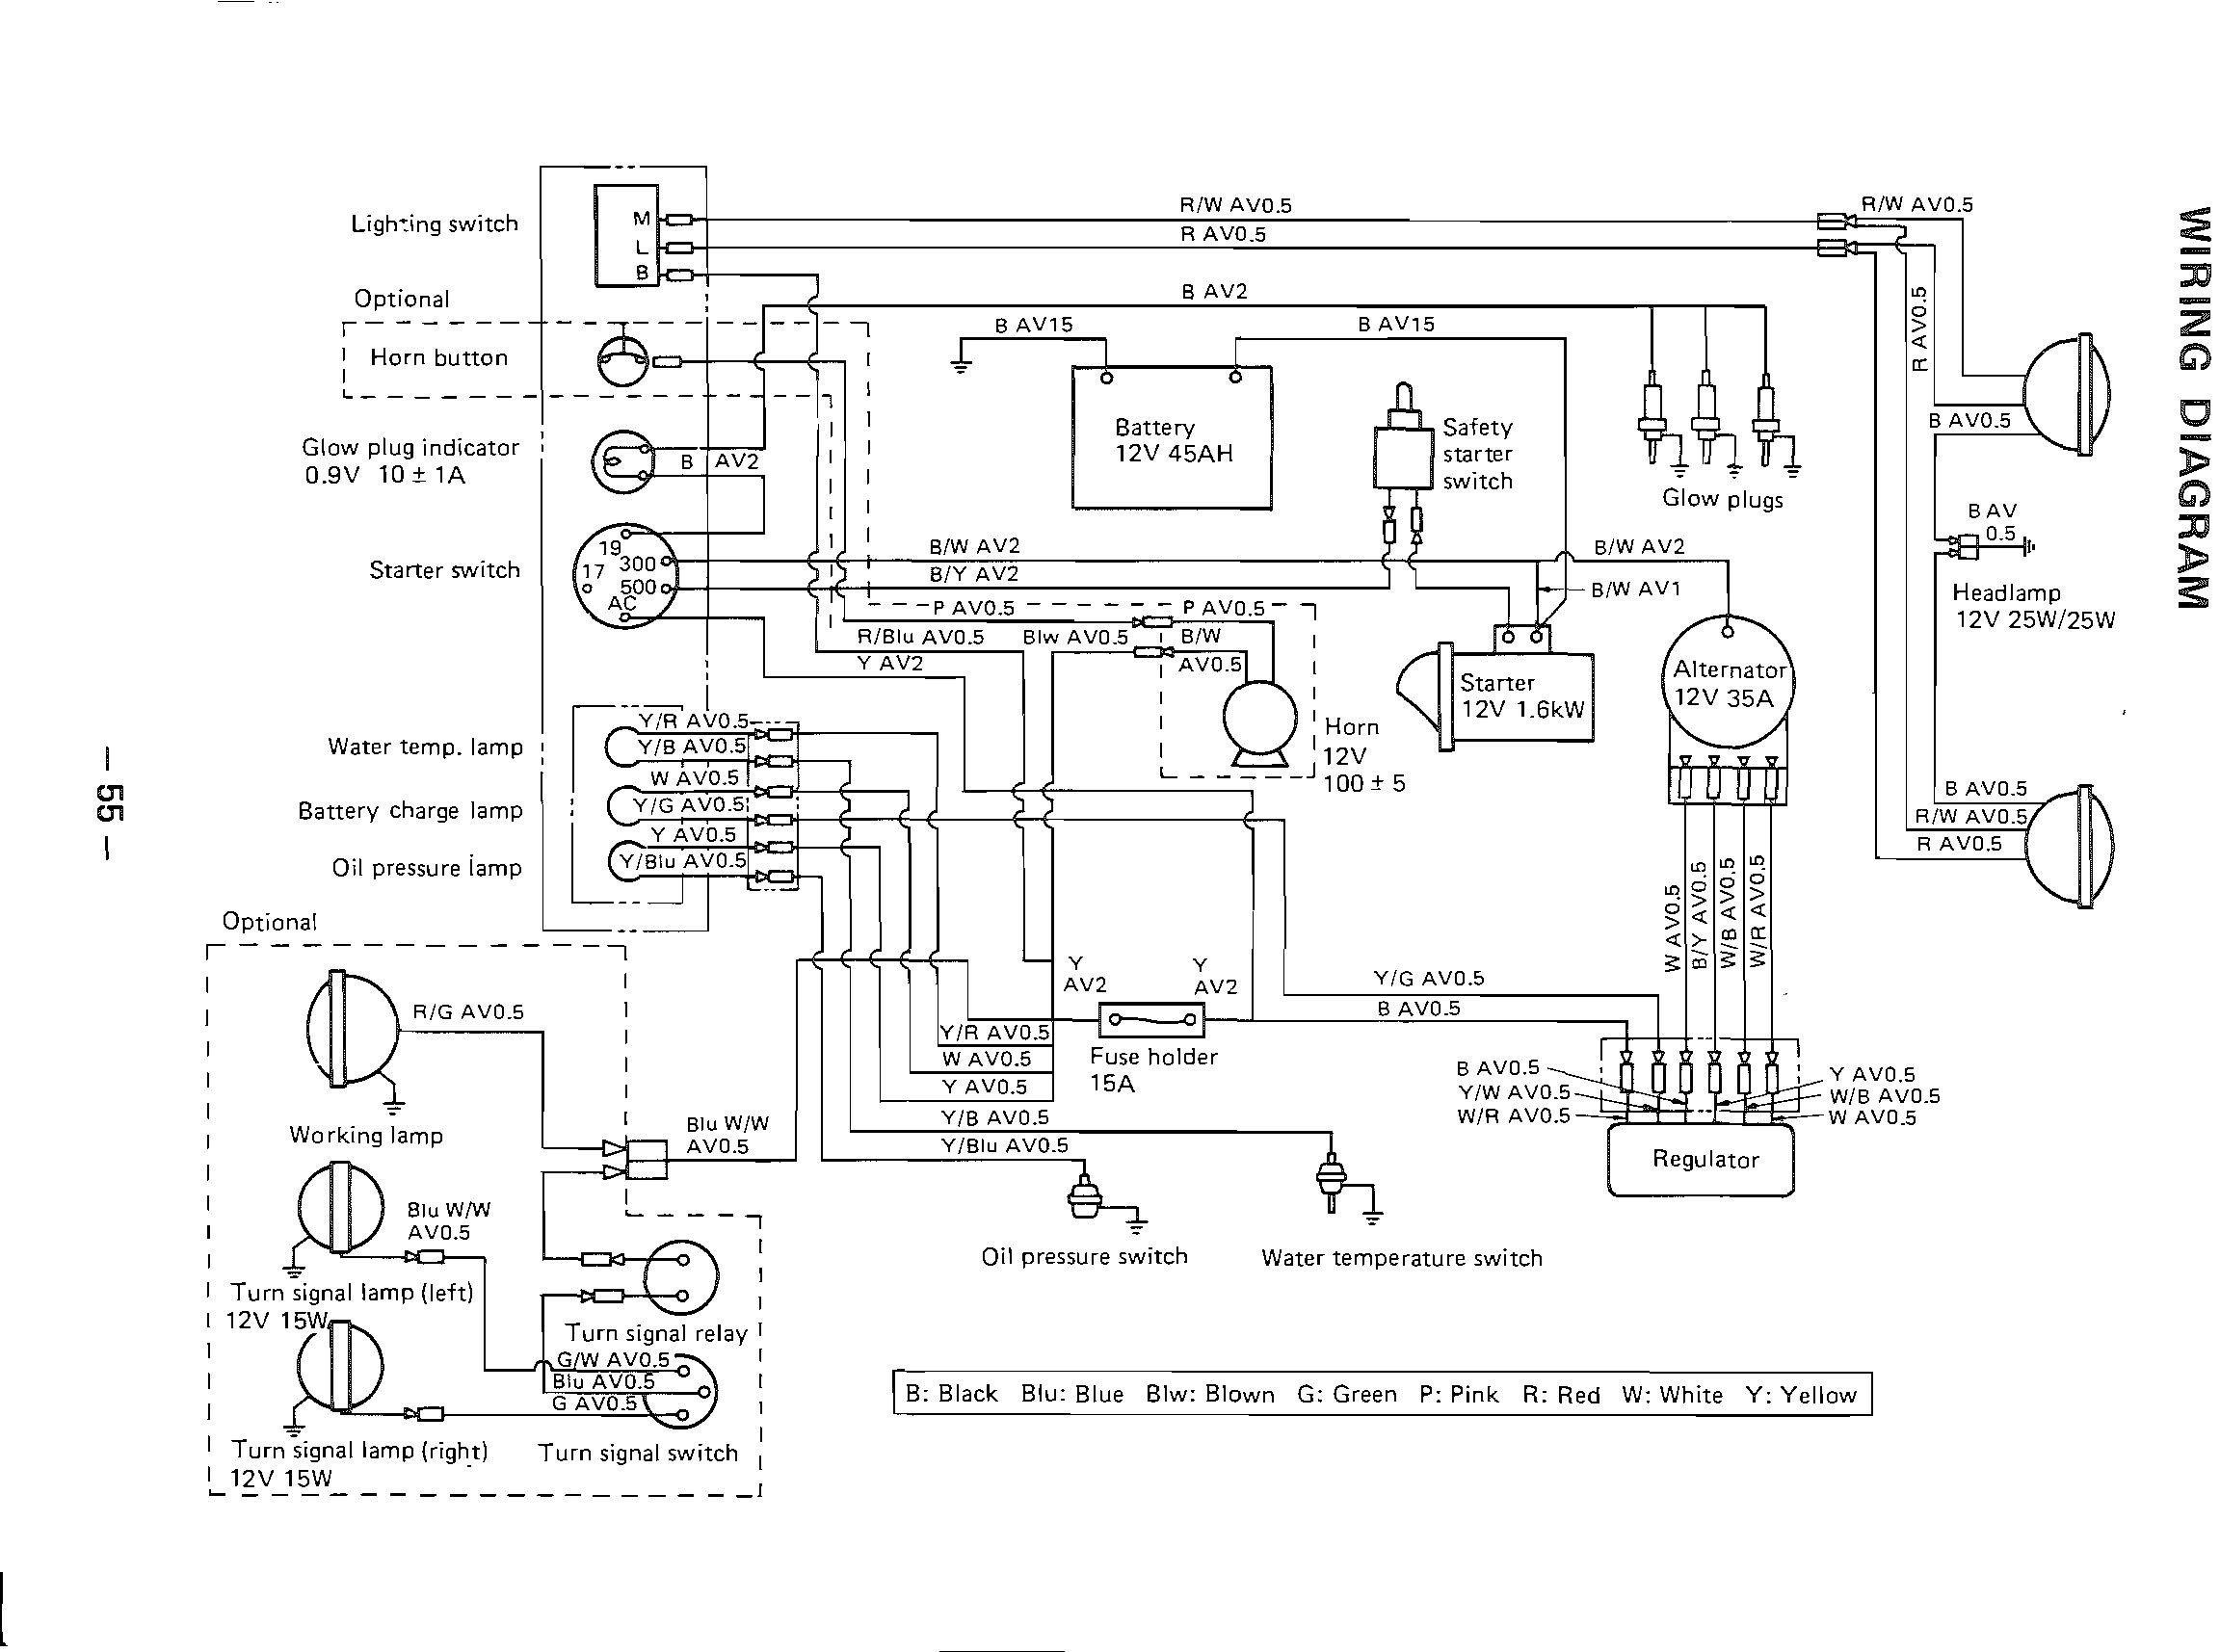 Schema electrique massey ferguson 265